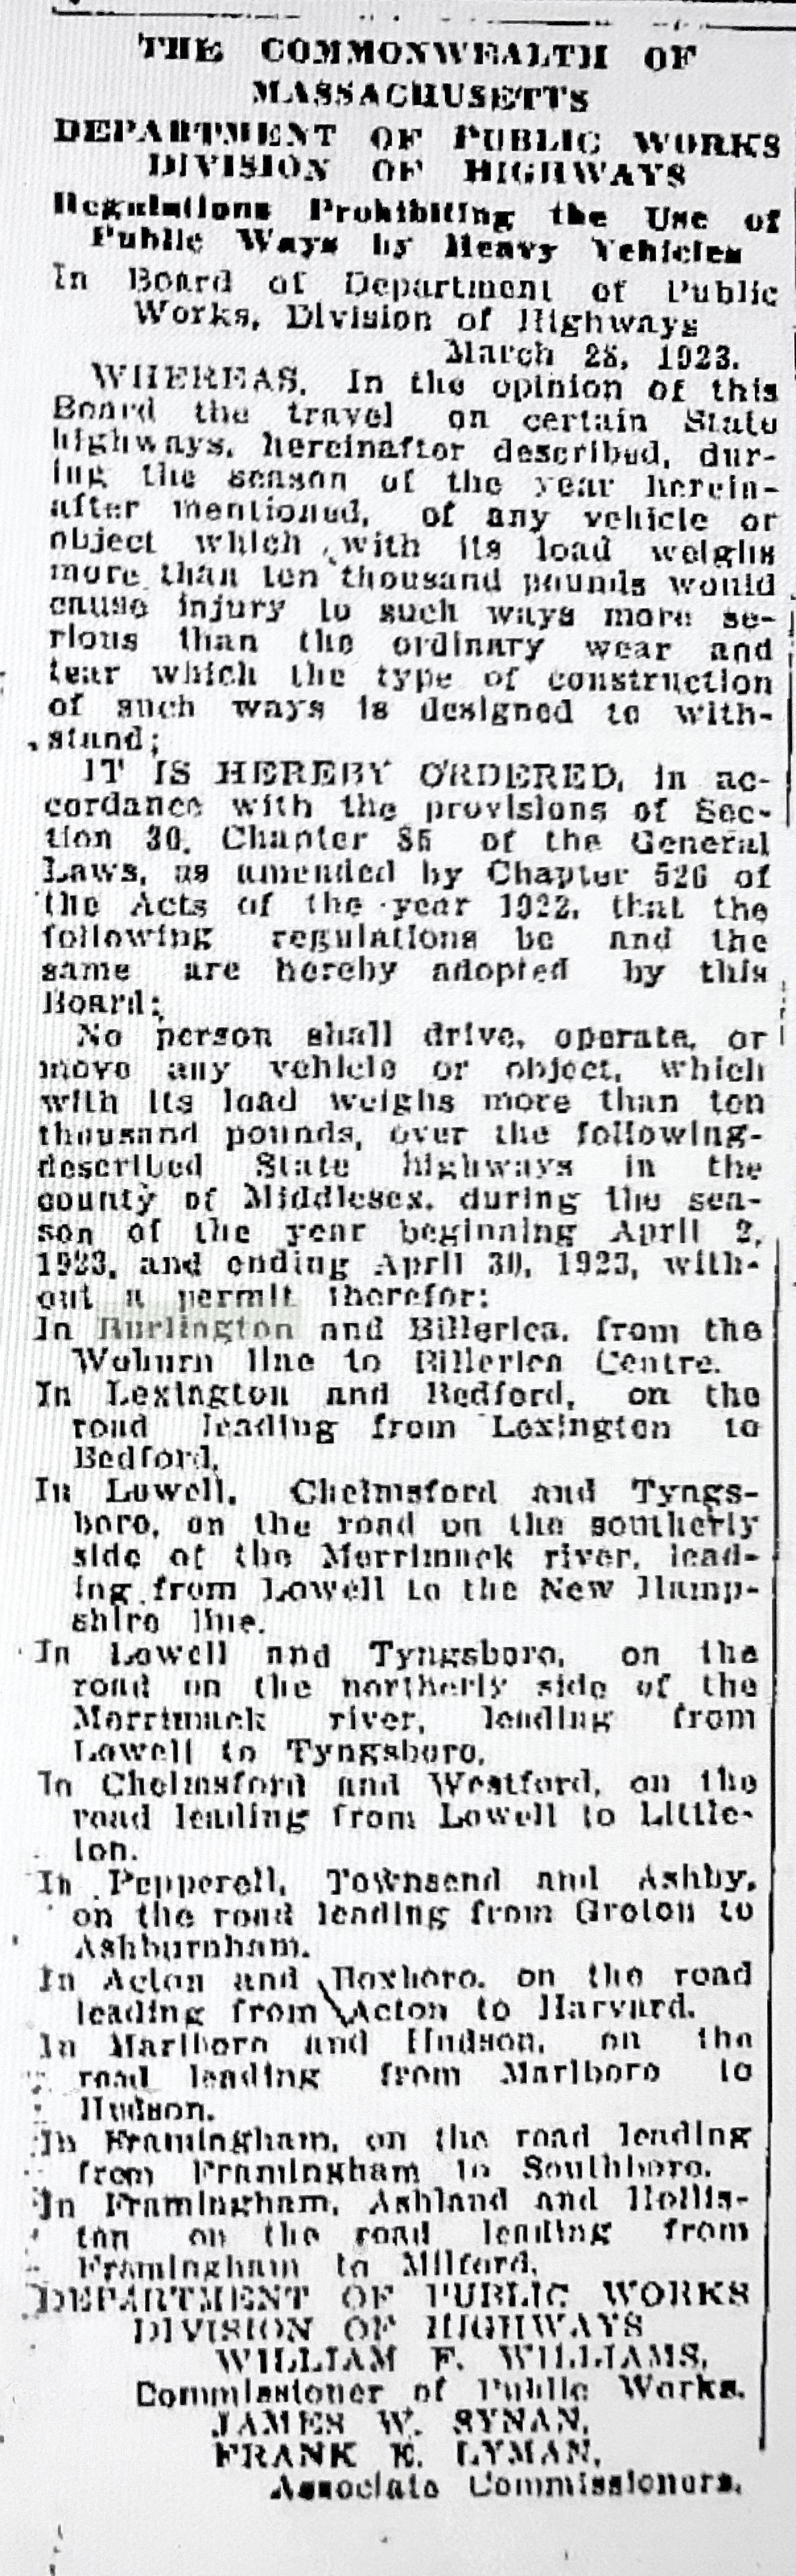 1923 truck ban on major roads, Burlington MA